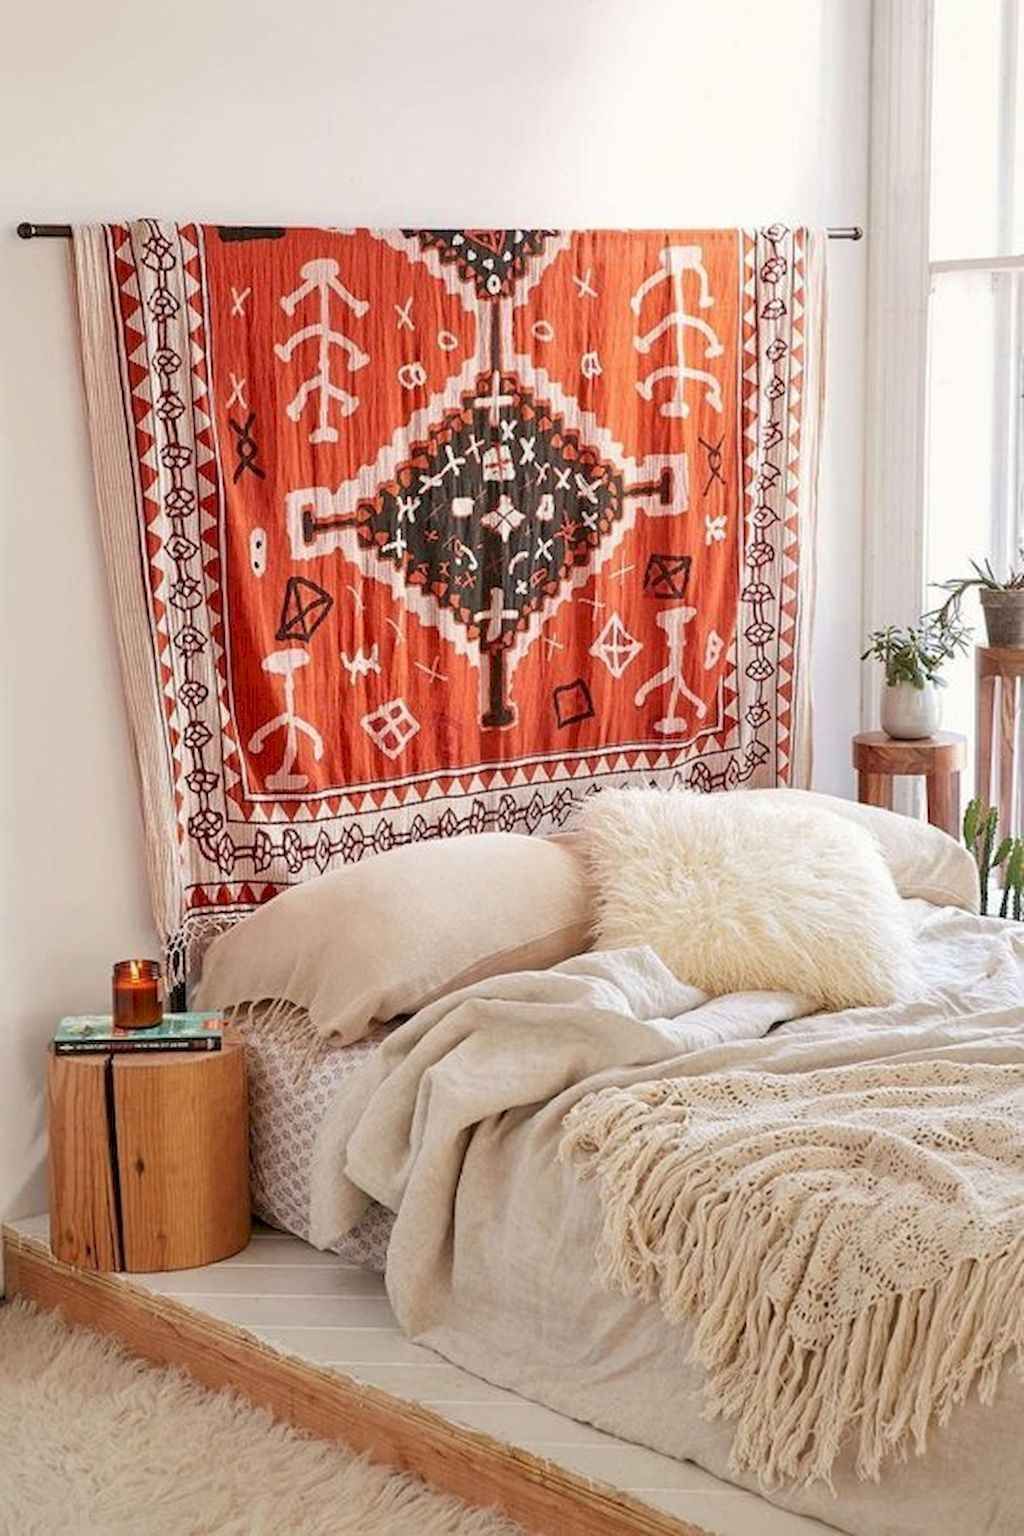 Small apartment decorating ideas (33)